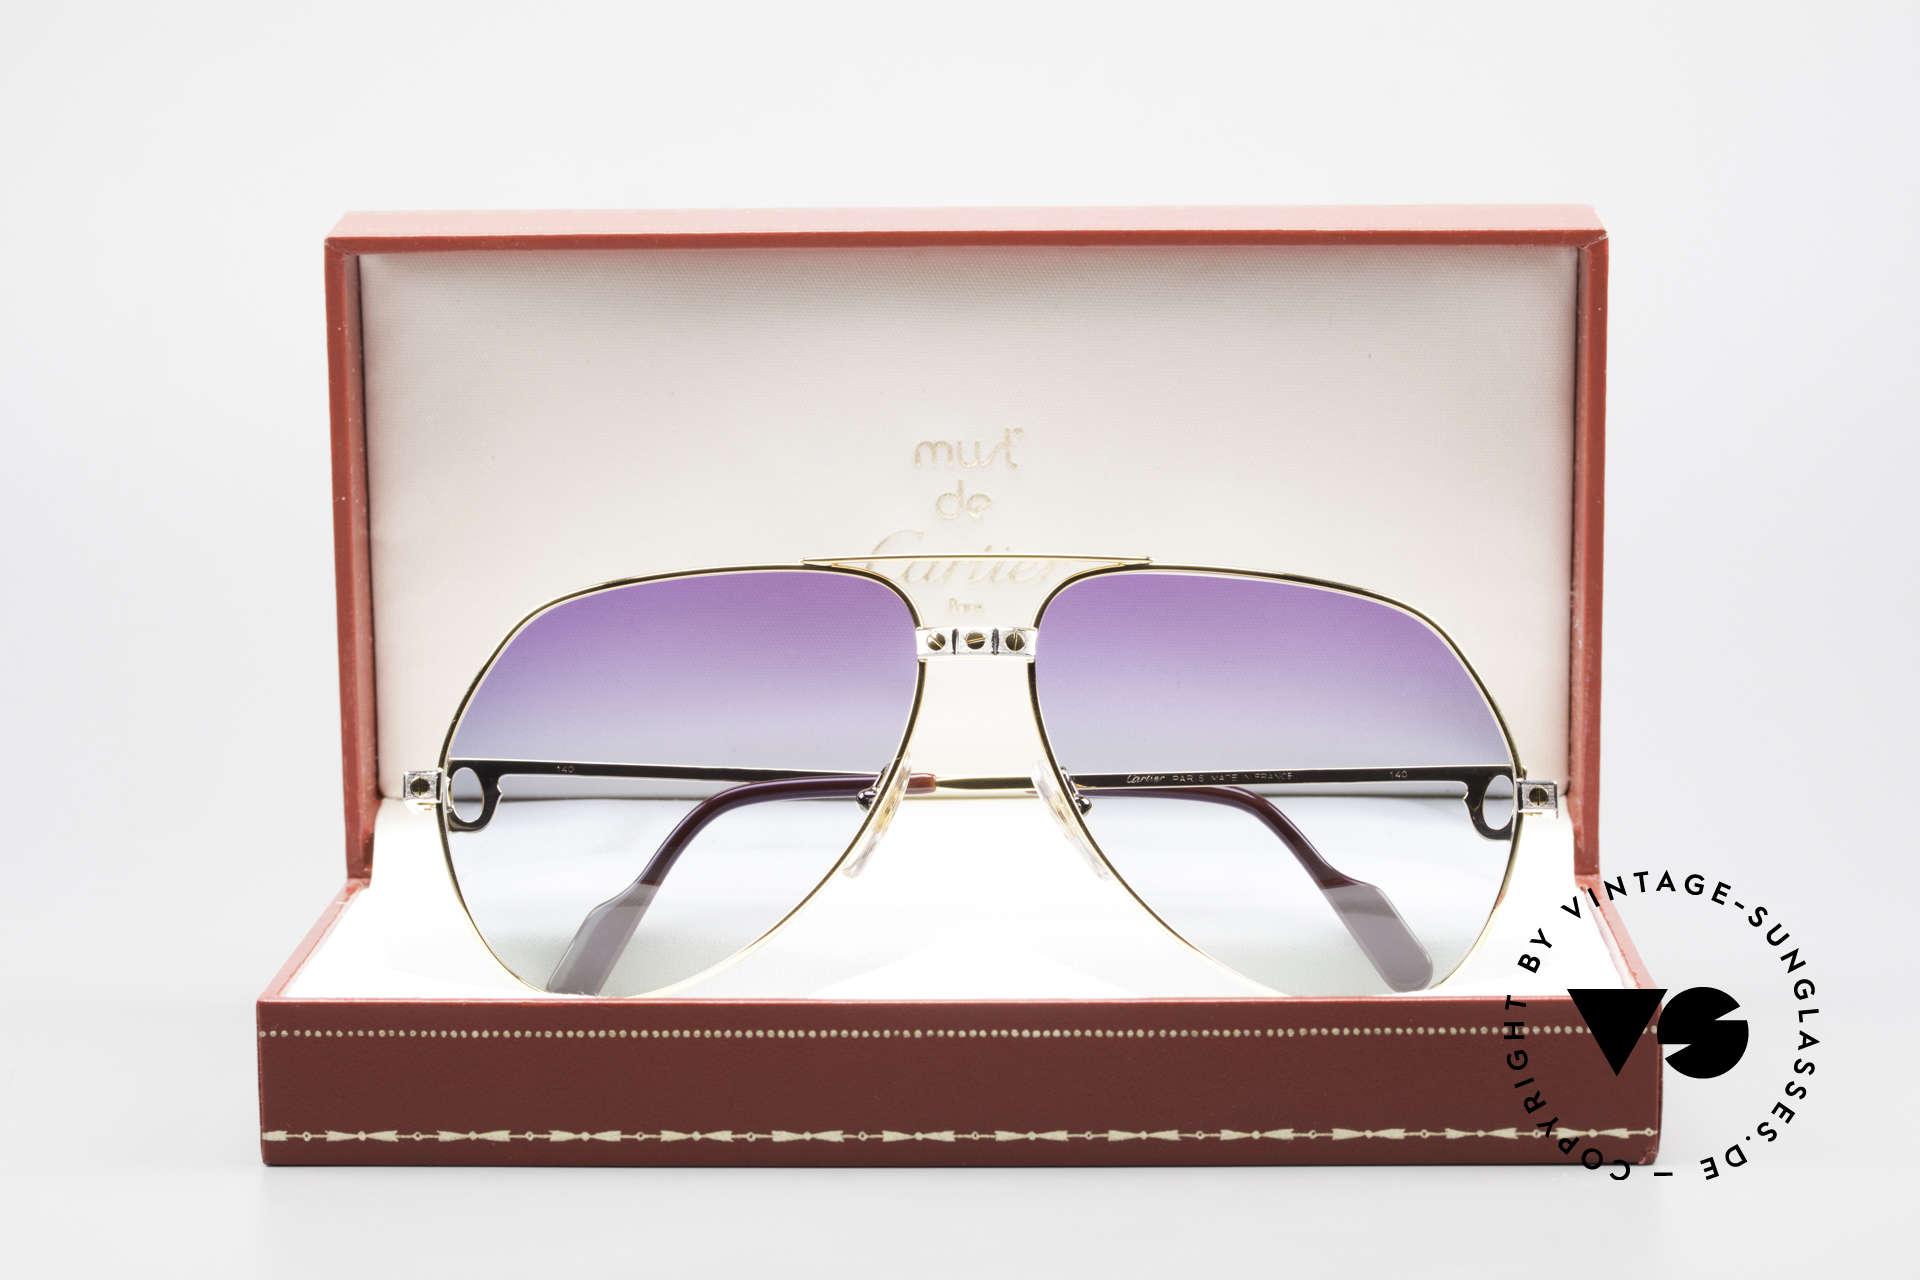 Cartier Vendome Santos - L Customized Purple Polar Lights, NO RETRO sunglasses, but an authentic vintage Original, Made for Men